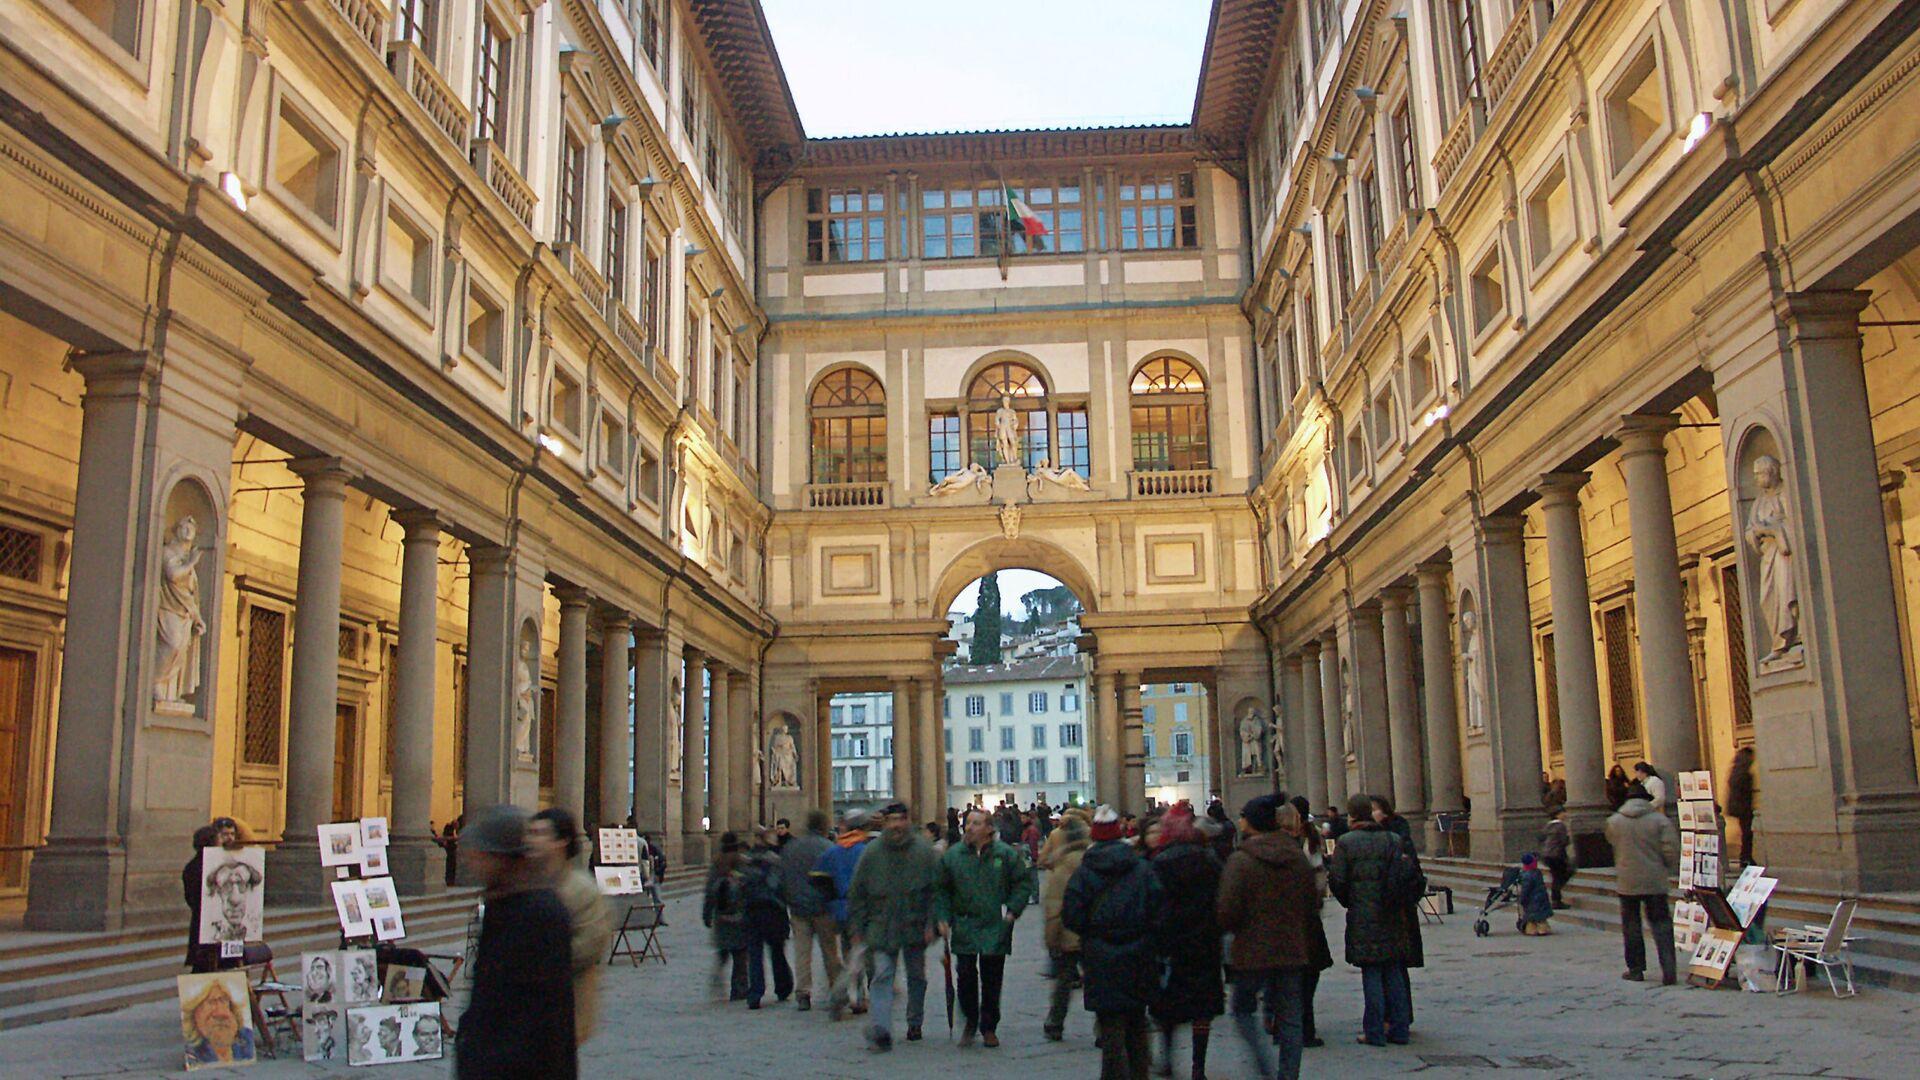 Gallerie degli Uffizi - Sputnik Italia, 1920, 26.05.2021